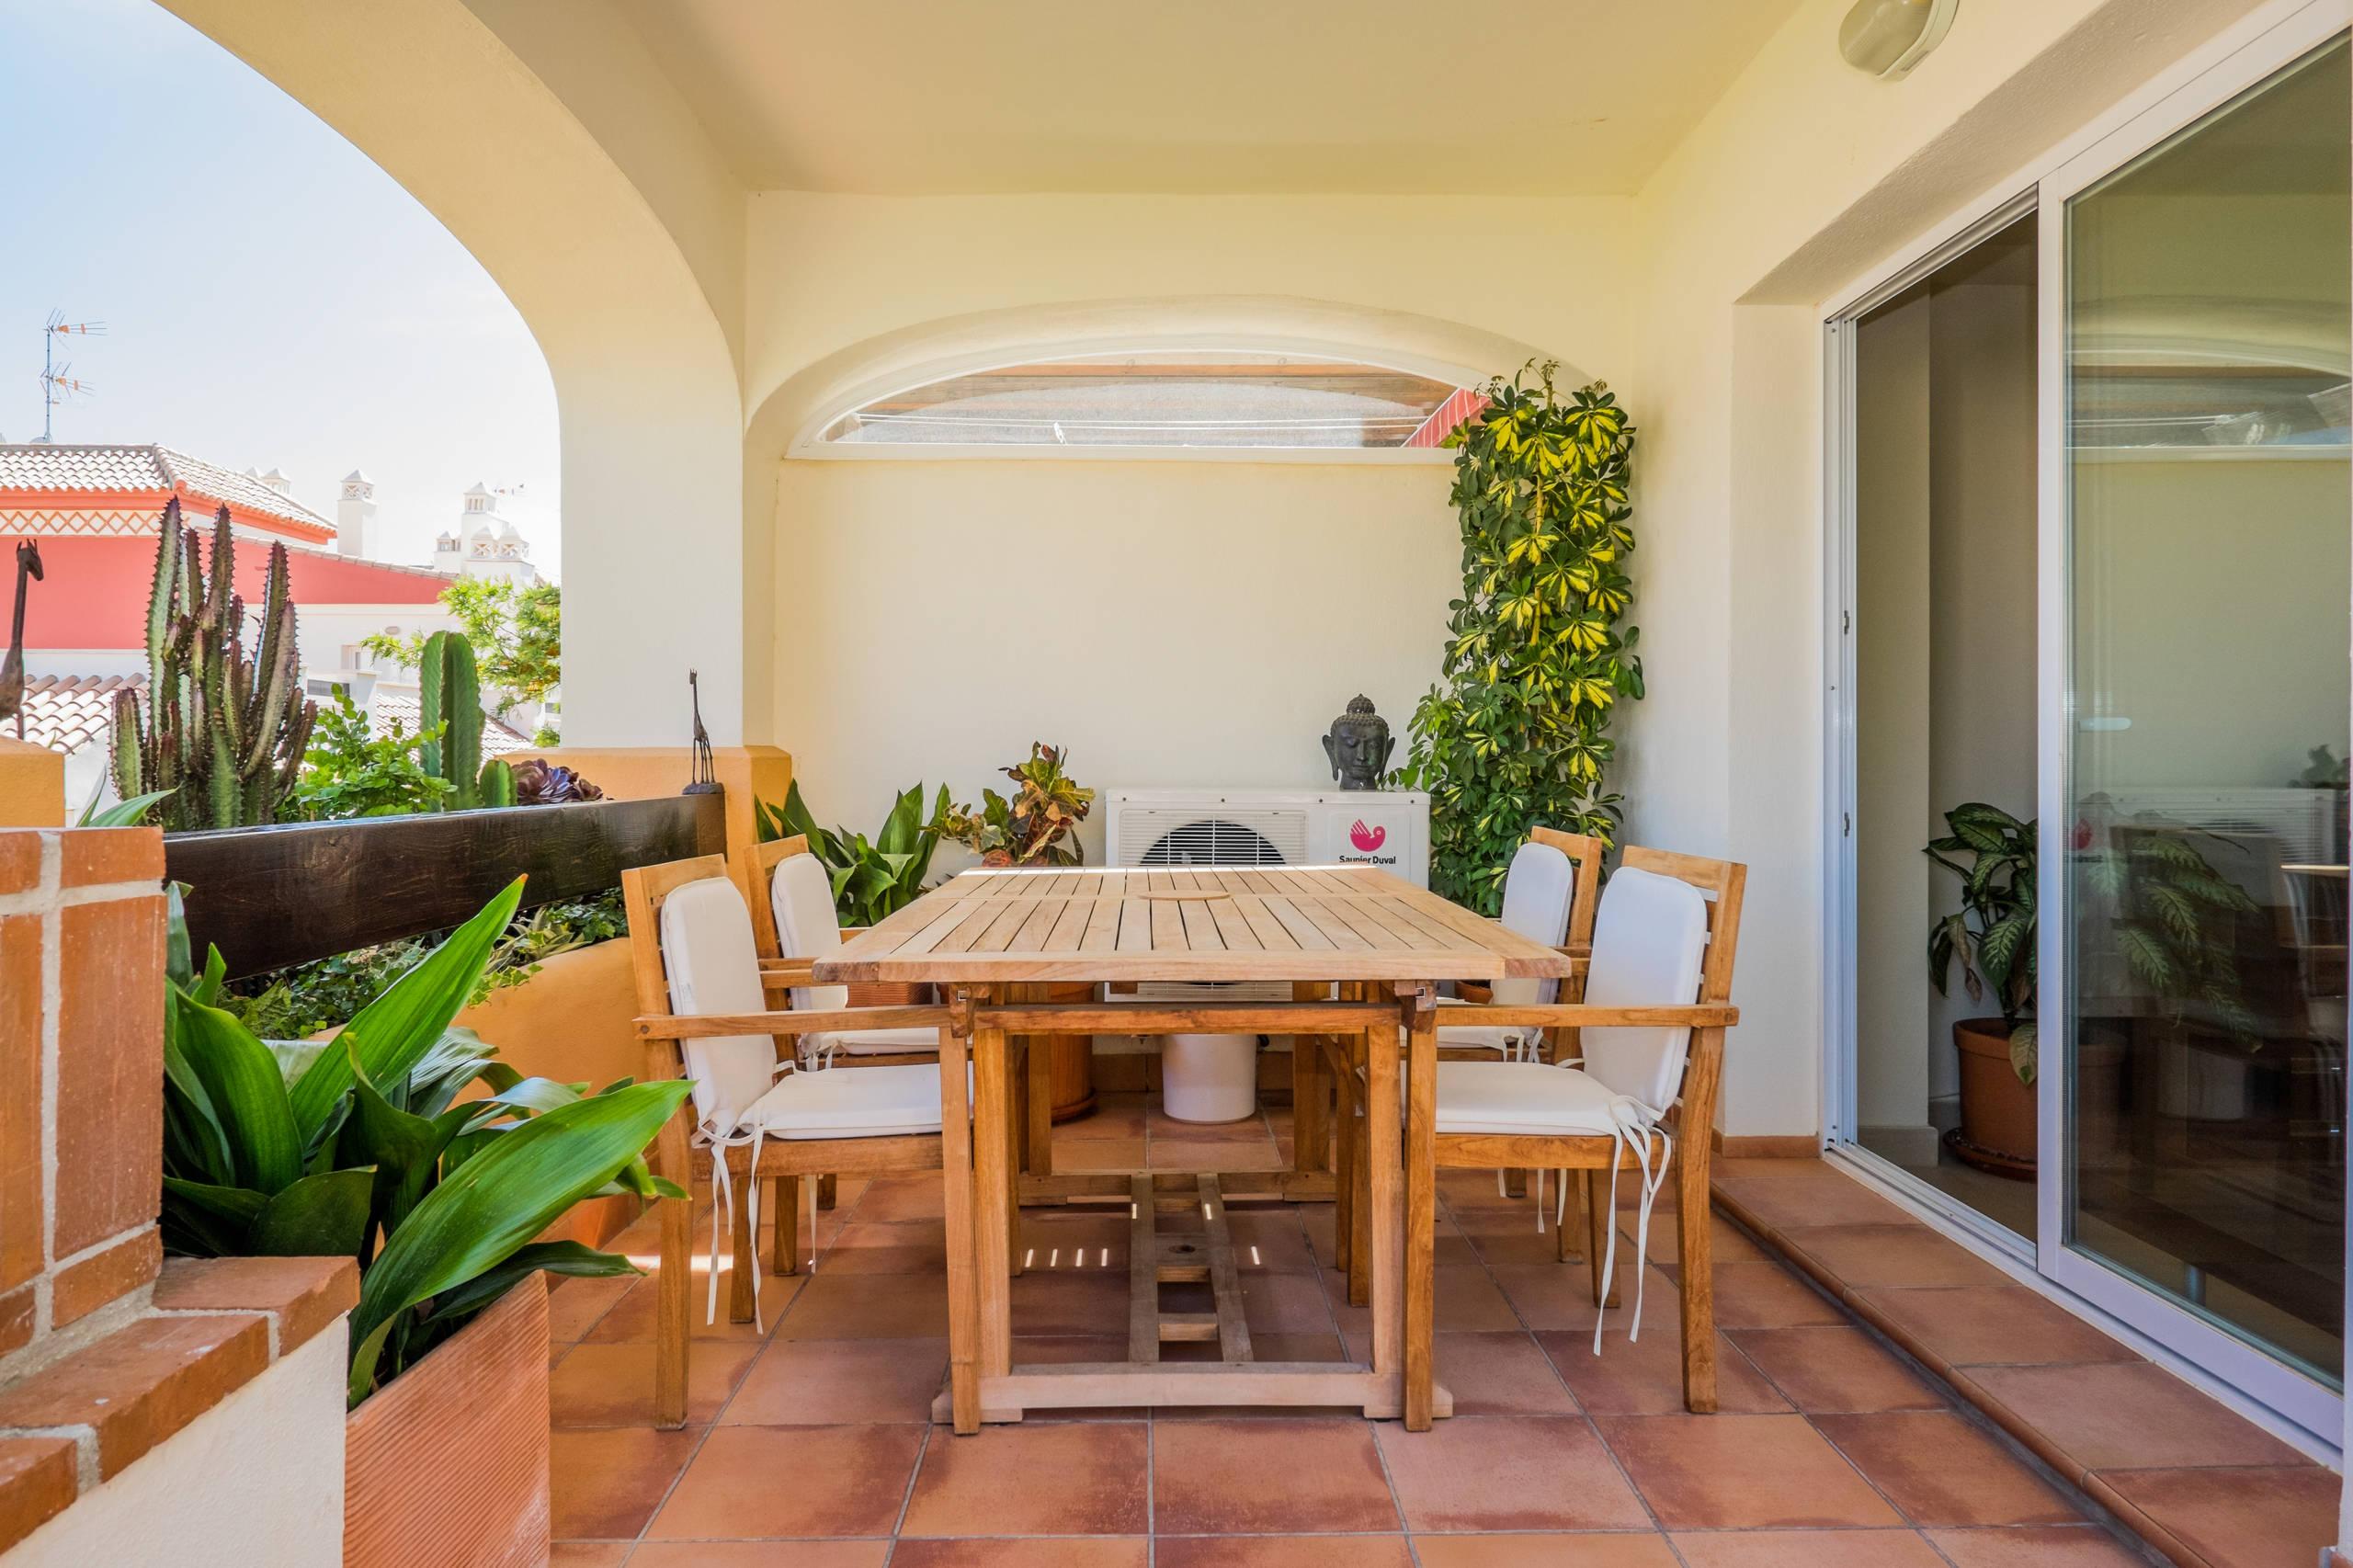 Summer House Ideas Interior >> 16 Good-looking Mediterranean Deck Designs For The Summer